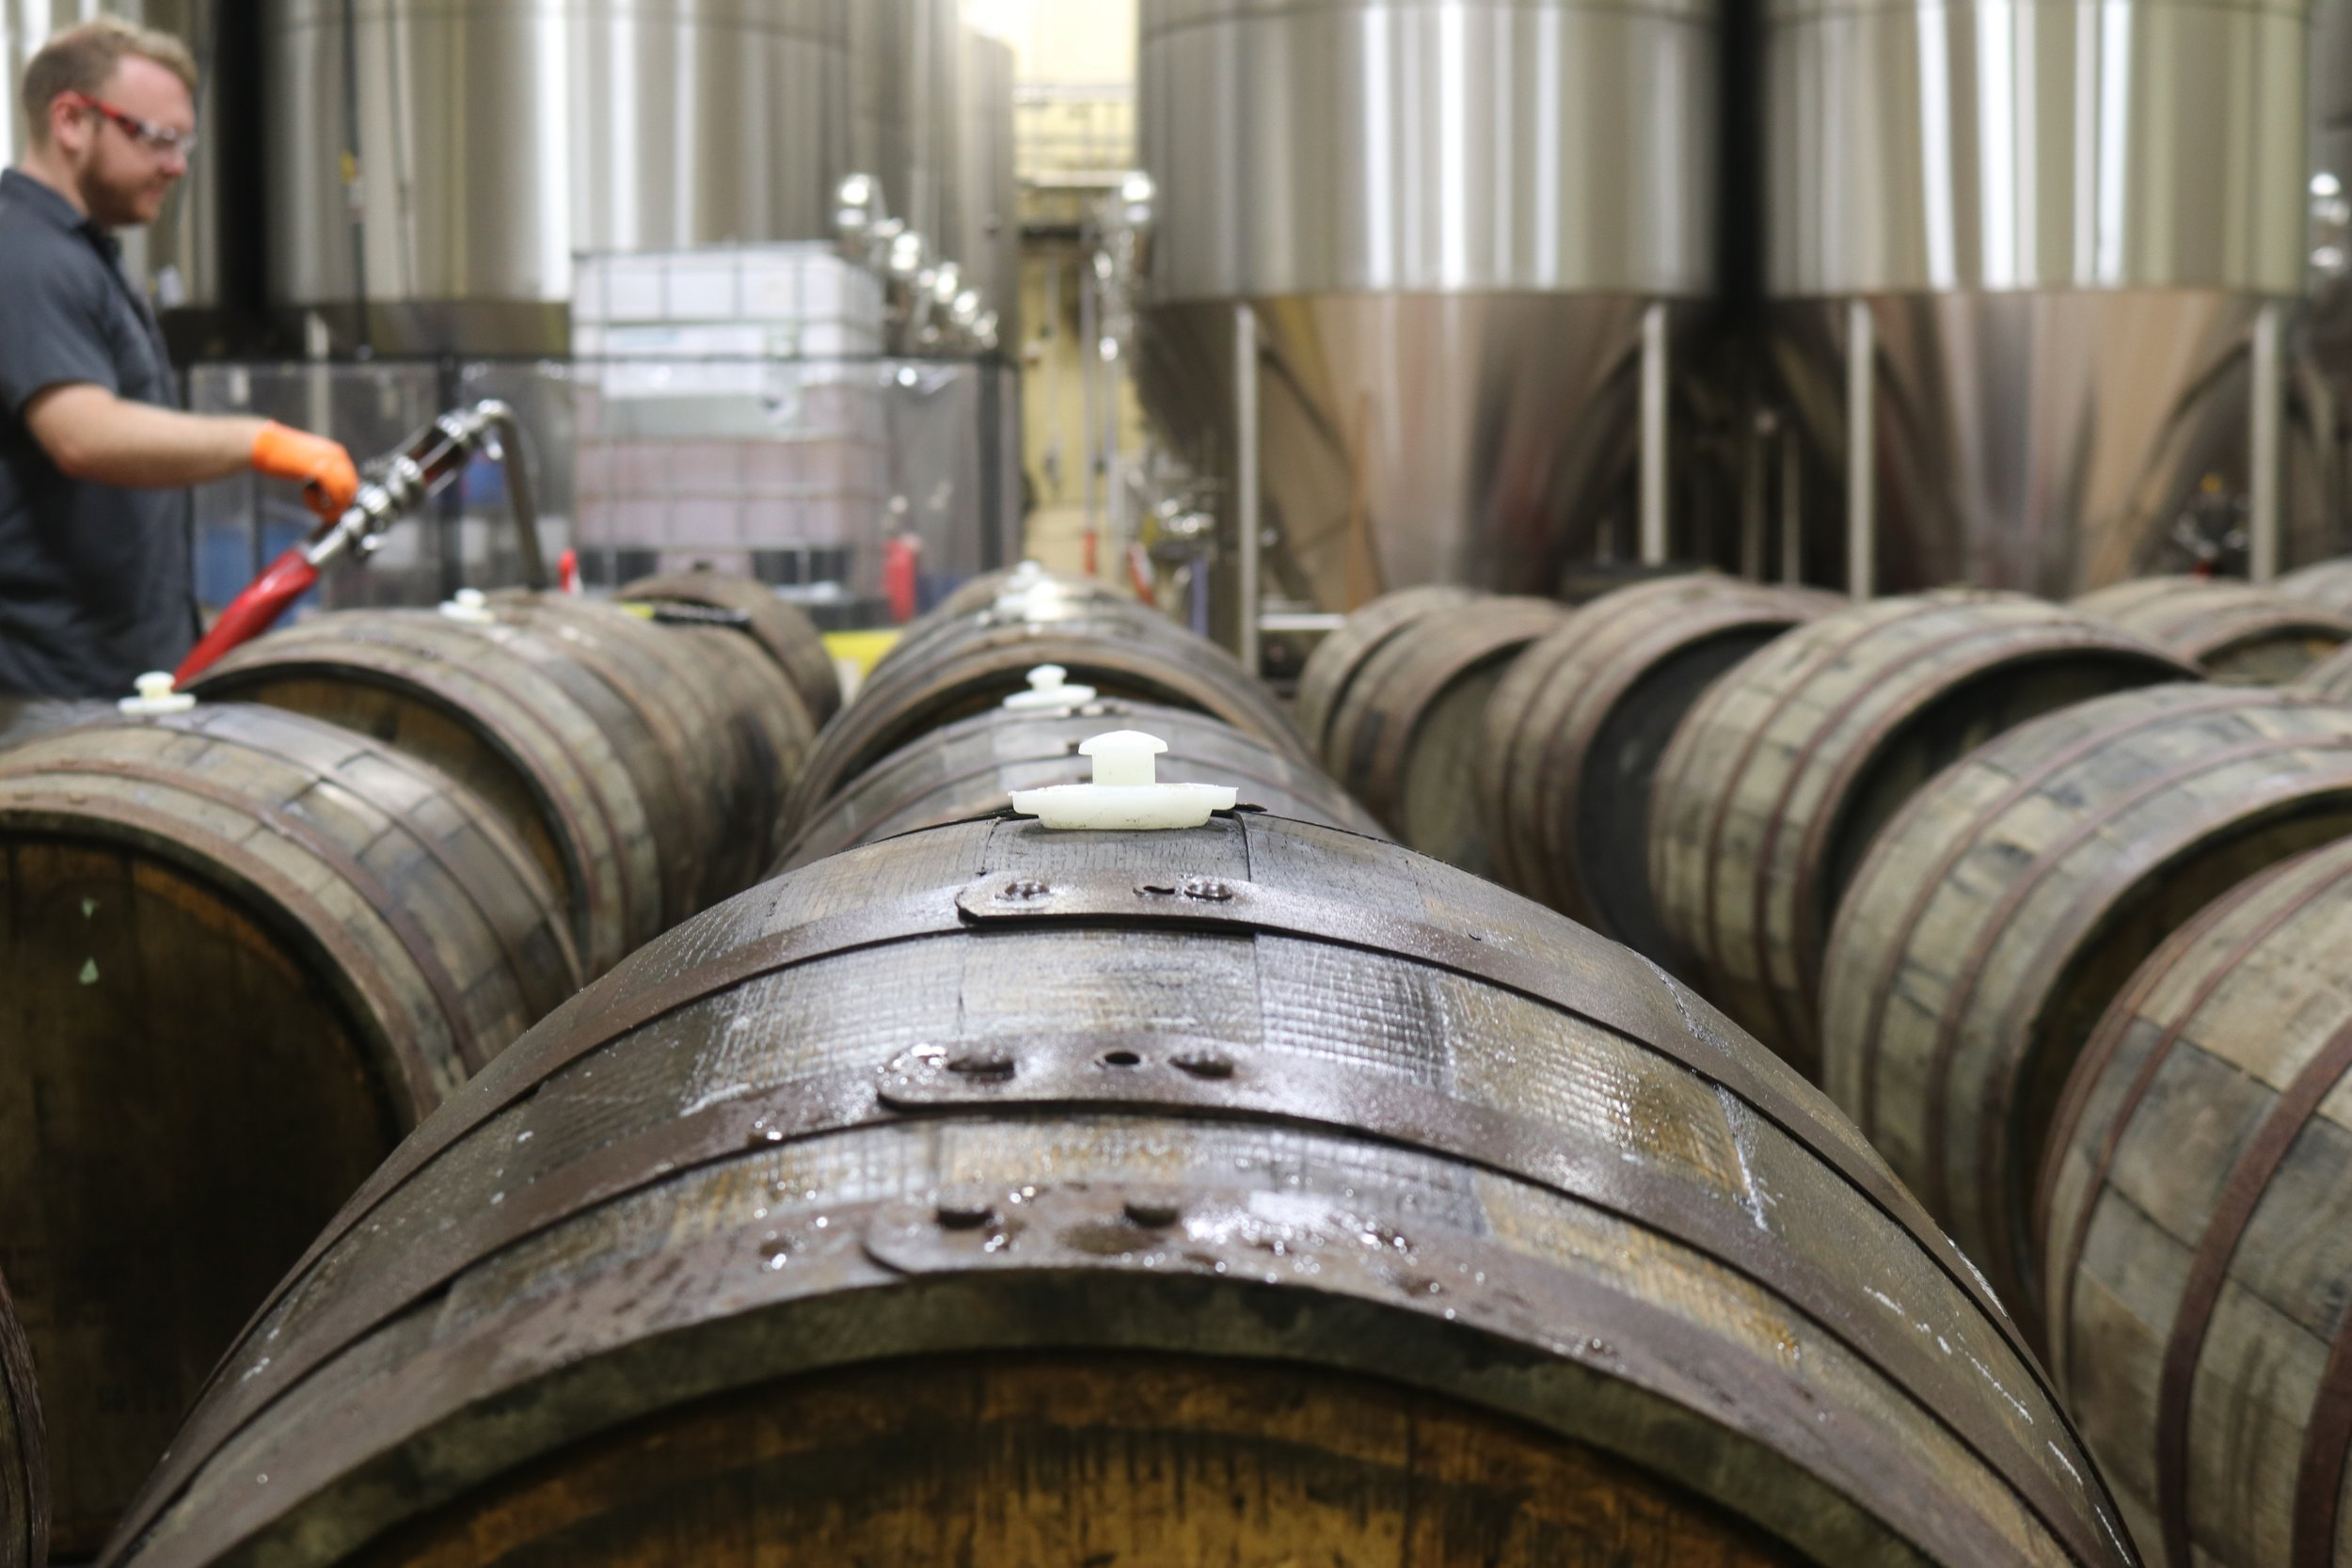 Barrels in brewing facility